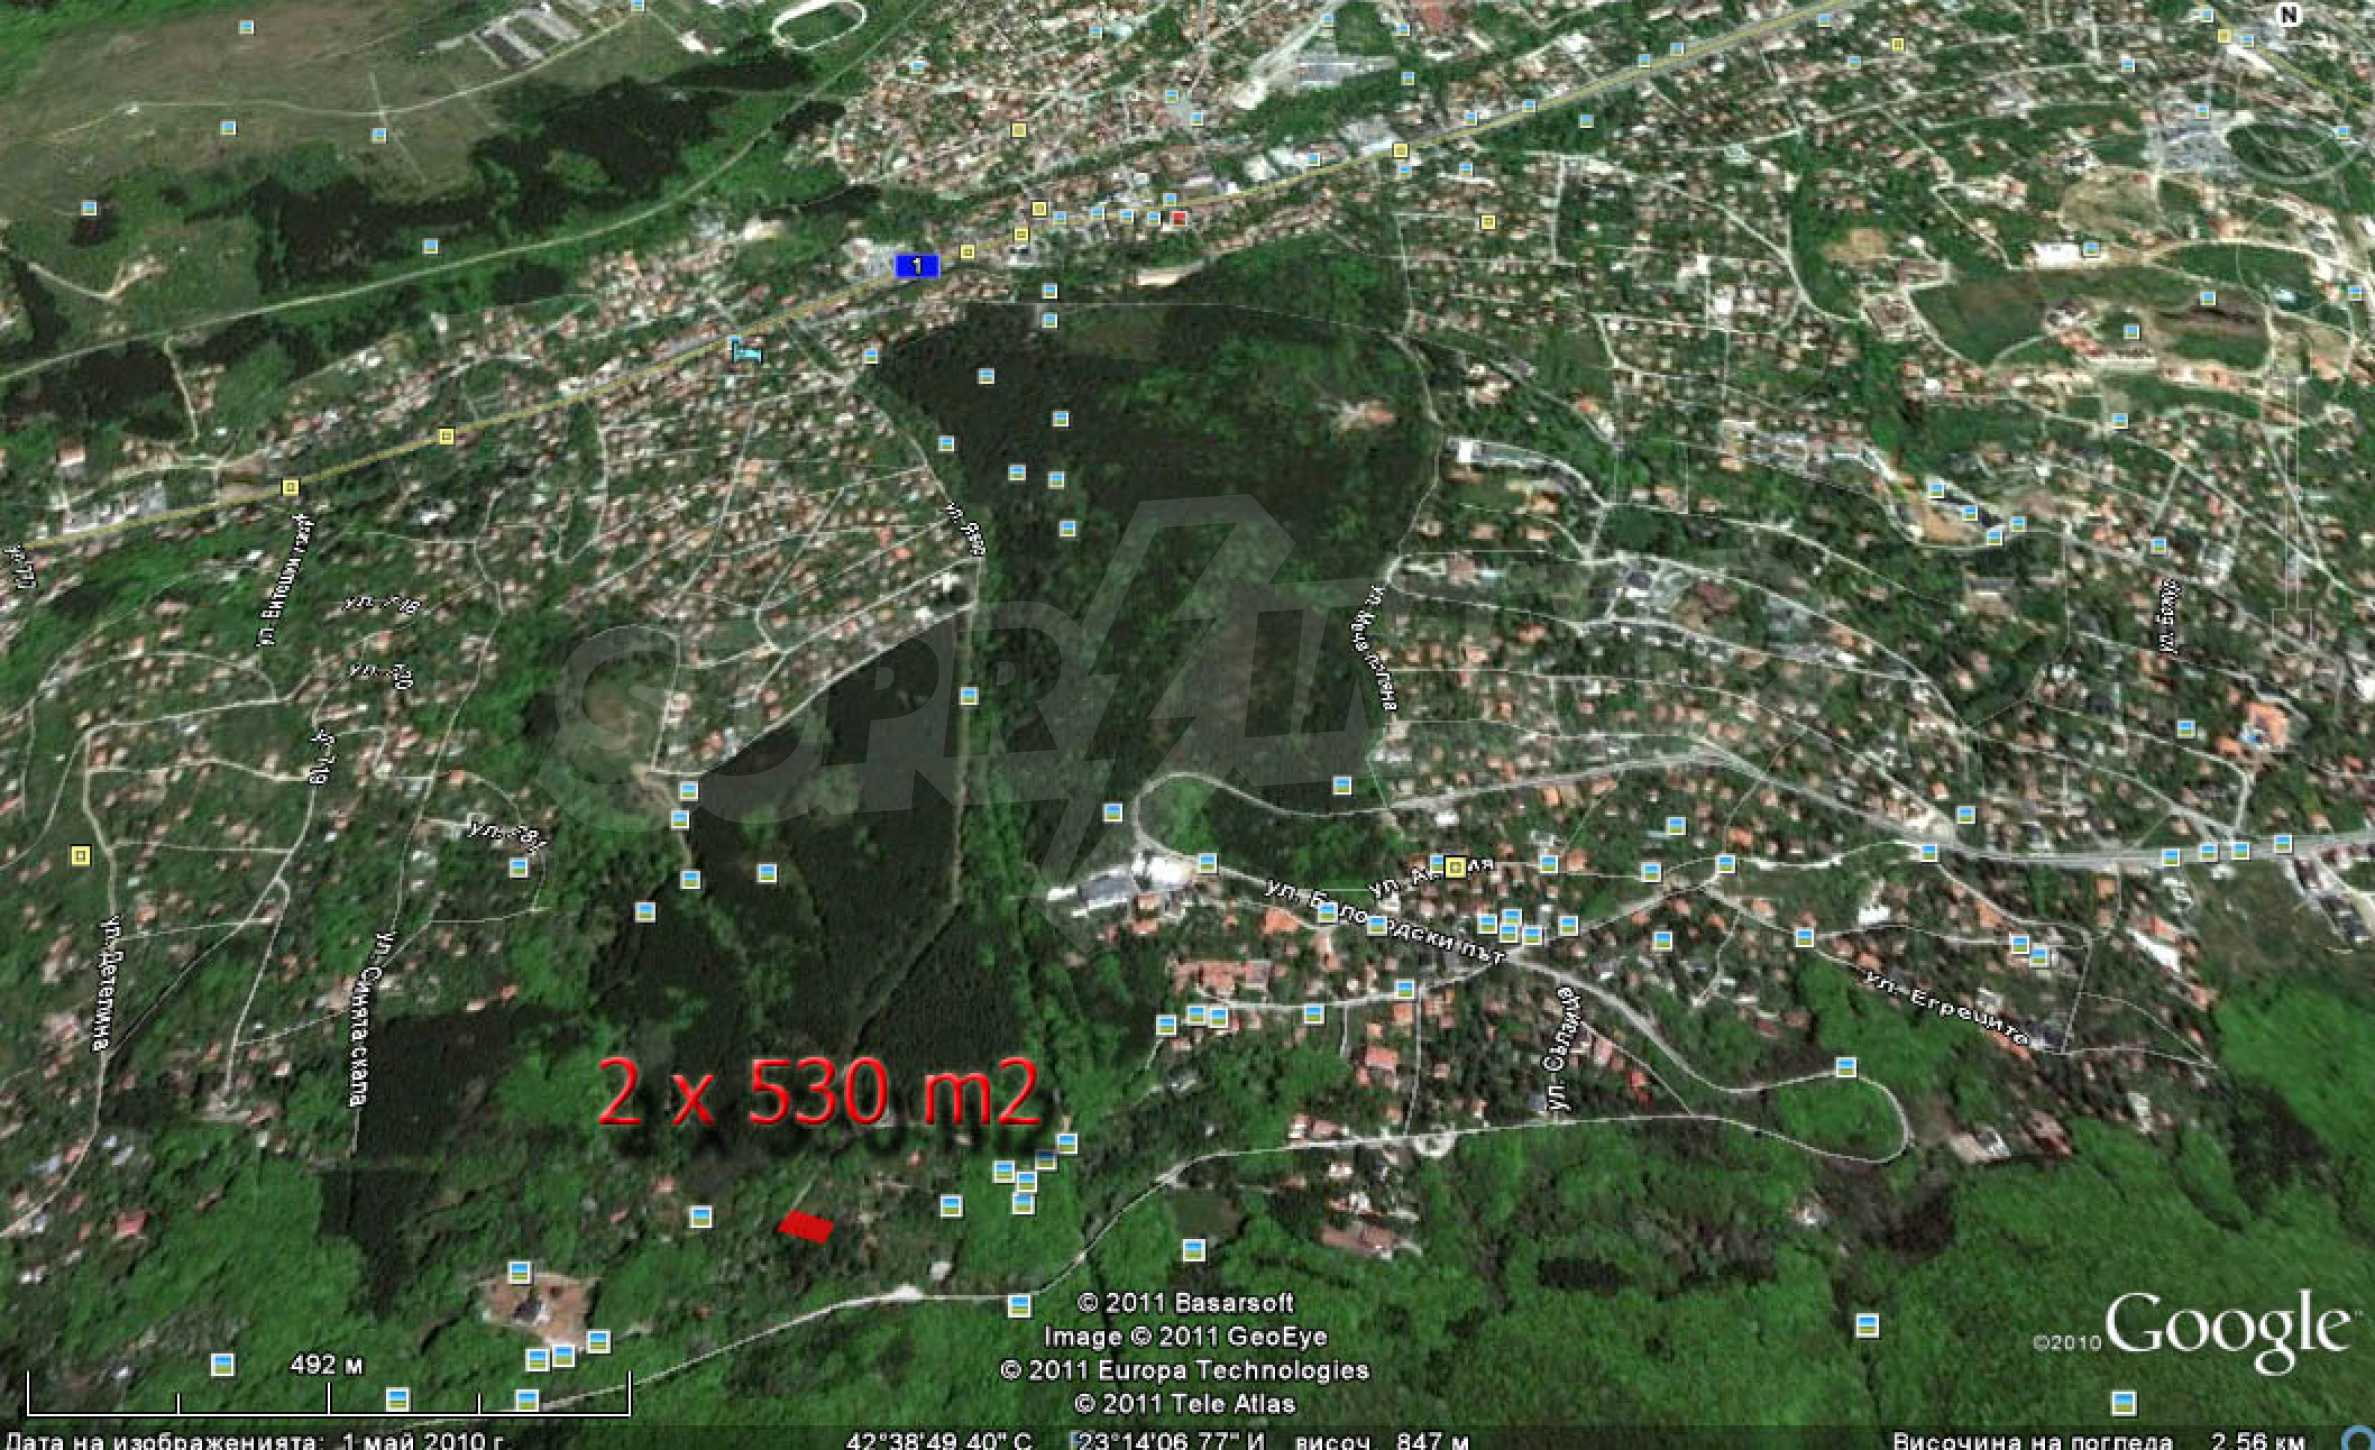 Two plots for sale in Boyan, Sofia. 10